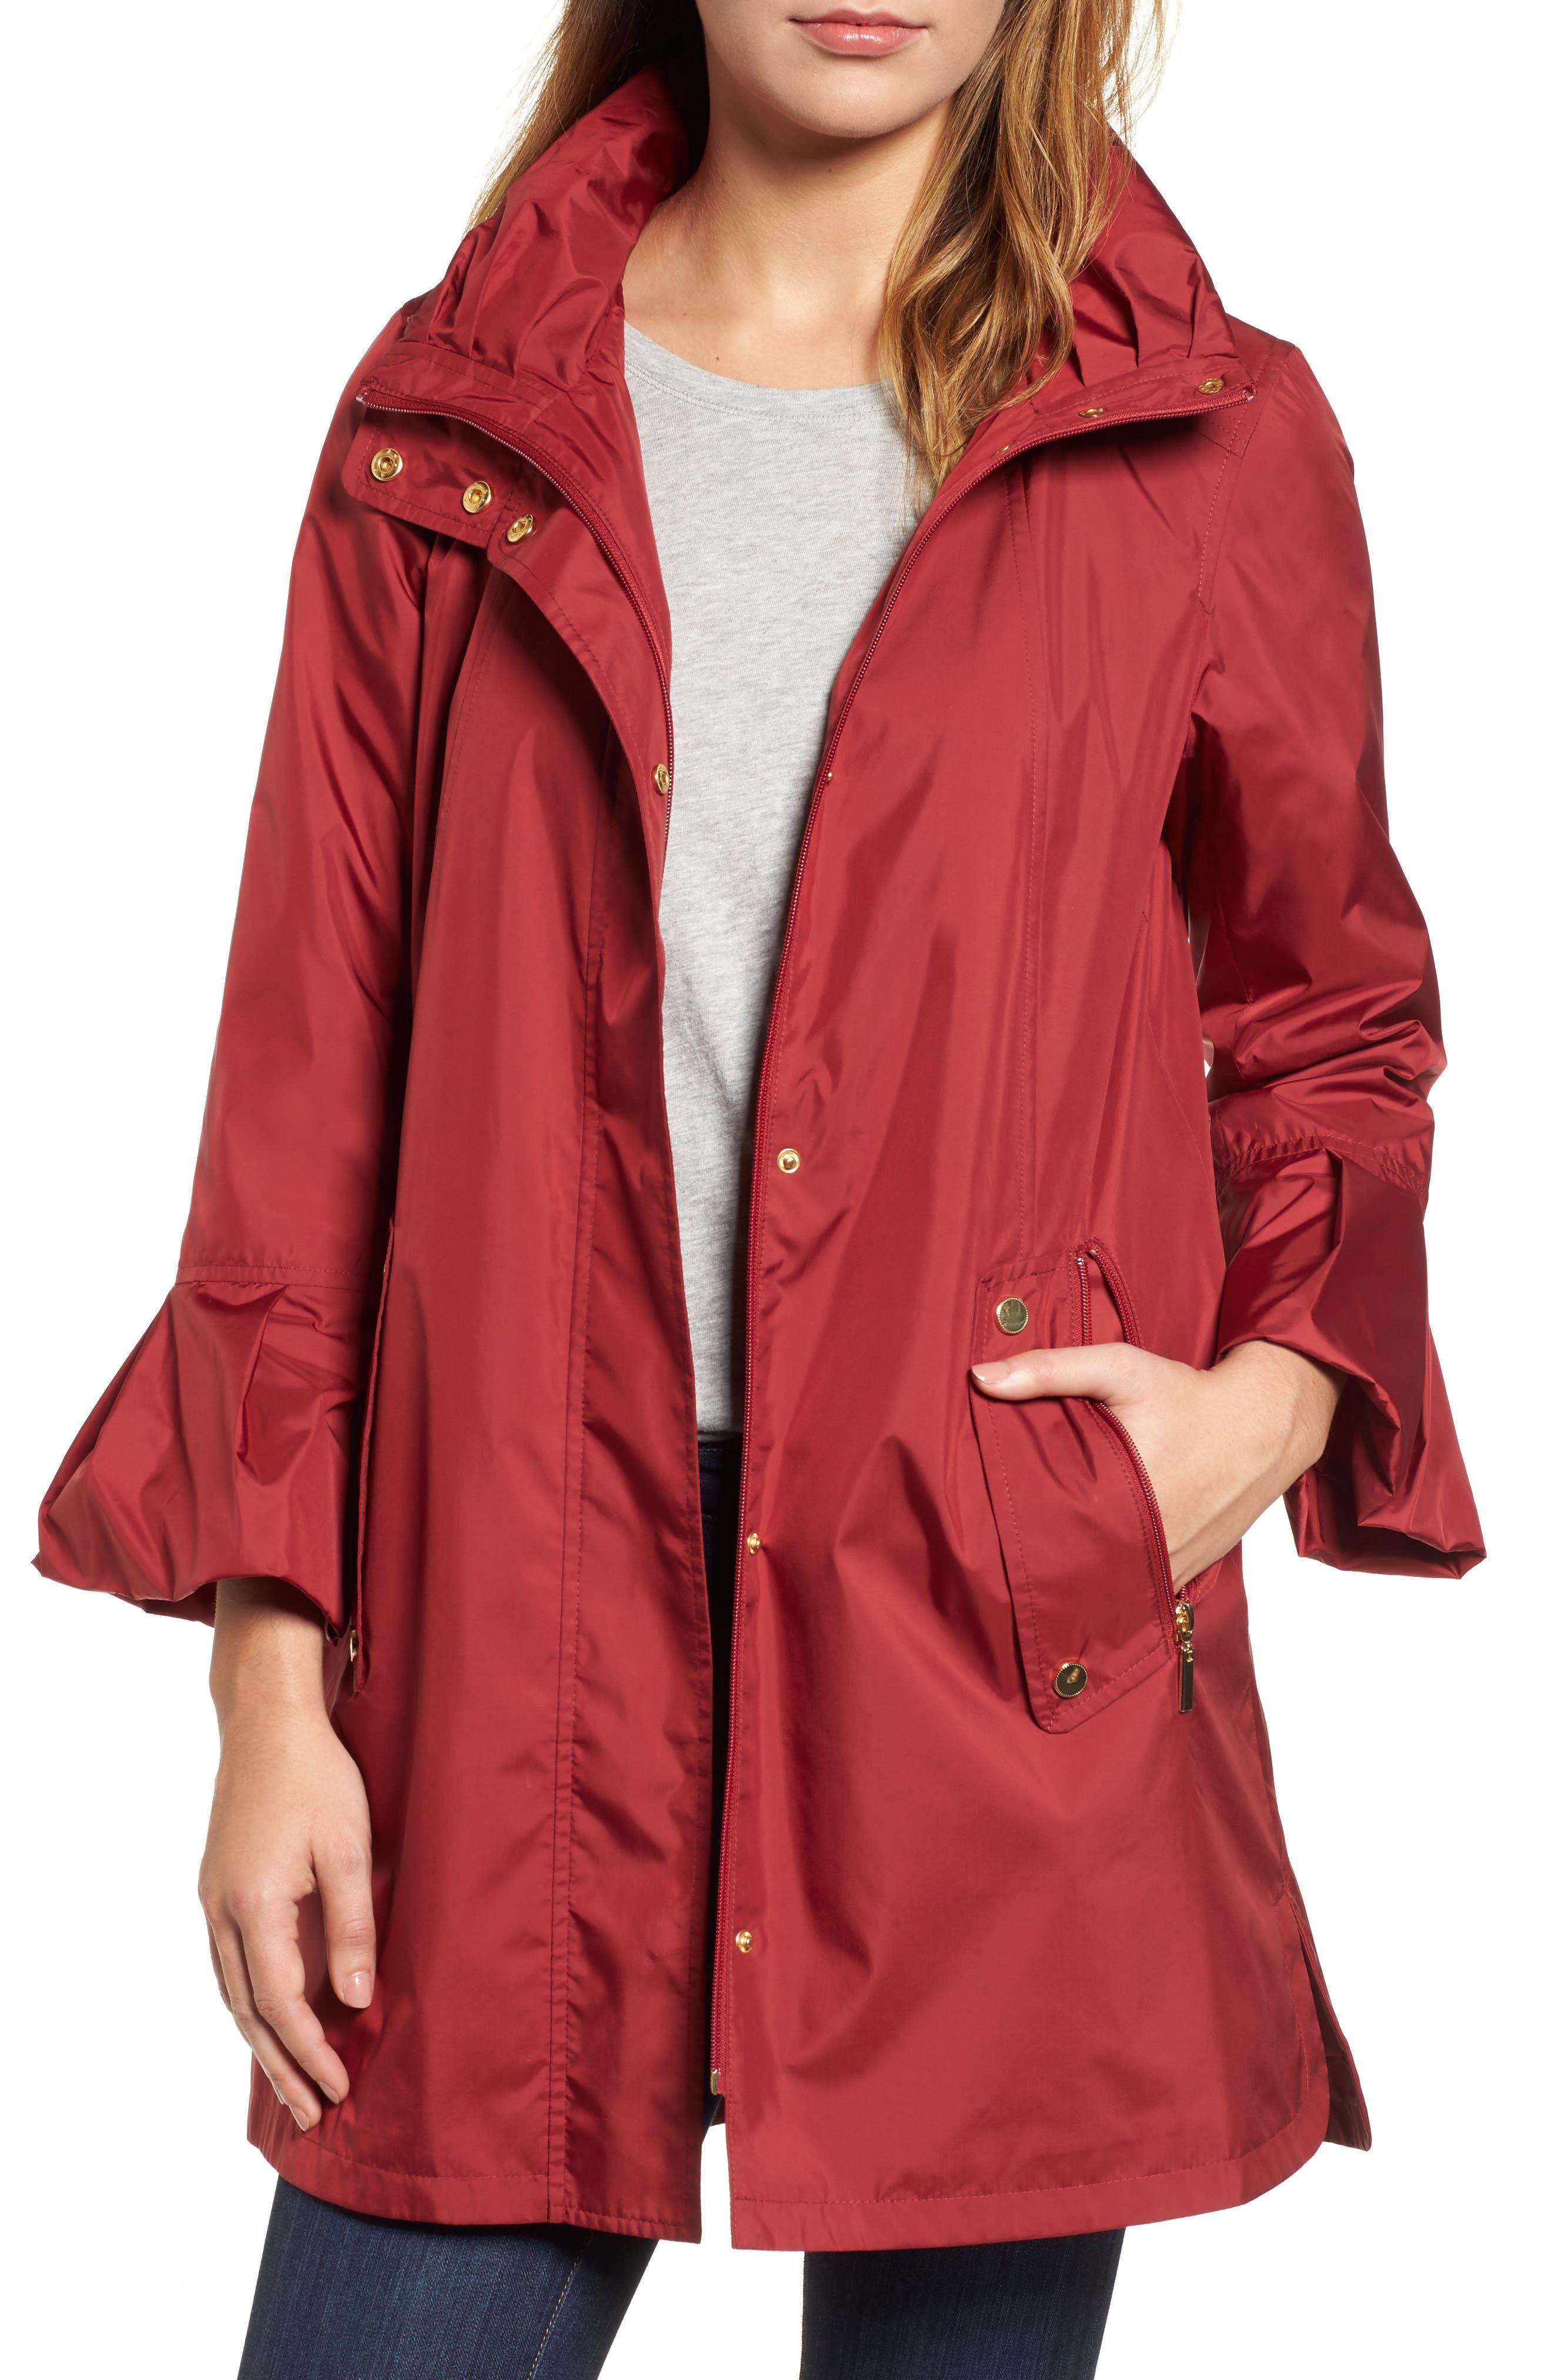 Flare Sleeve Packable Swing Jacket,                             Main thumbnail 1, color,                             Garnet